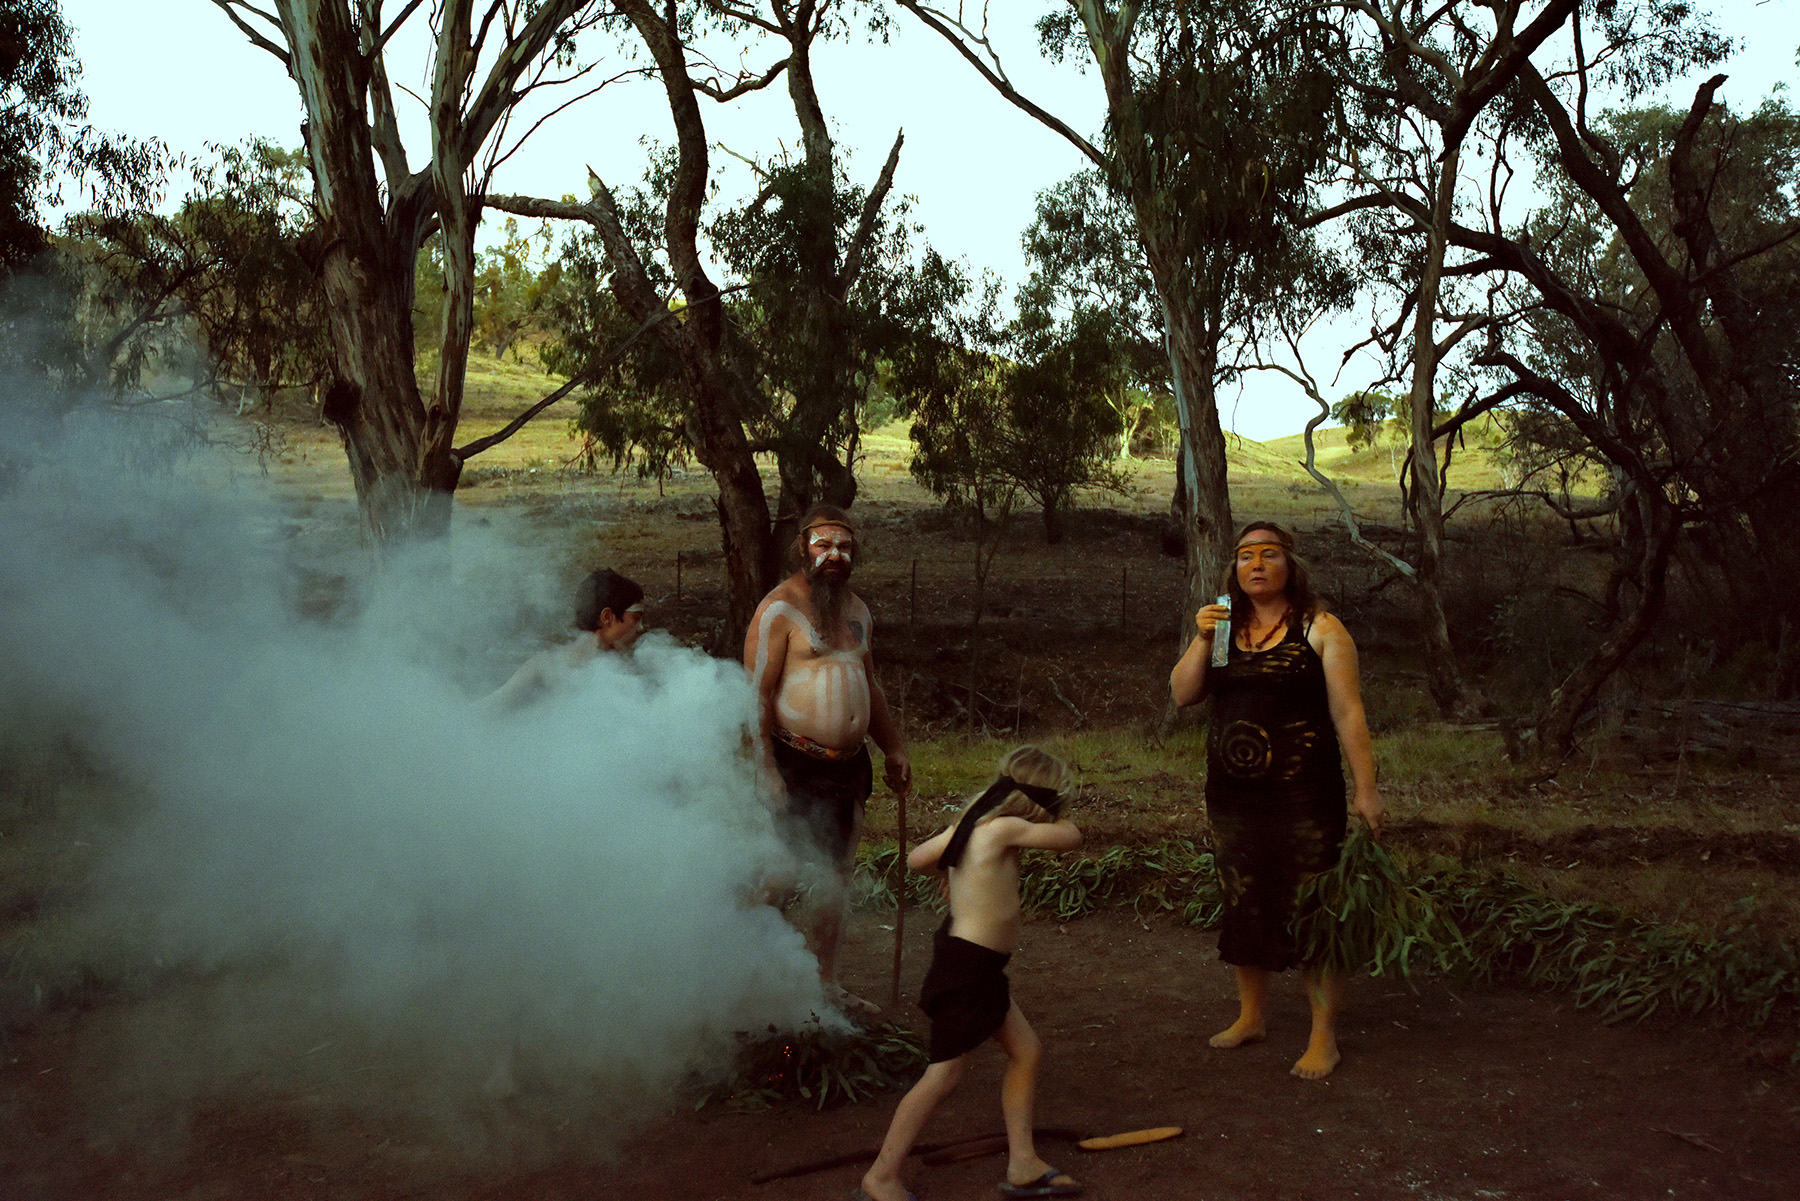 Australian Photography Awards